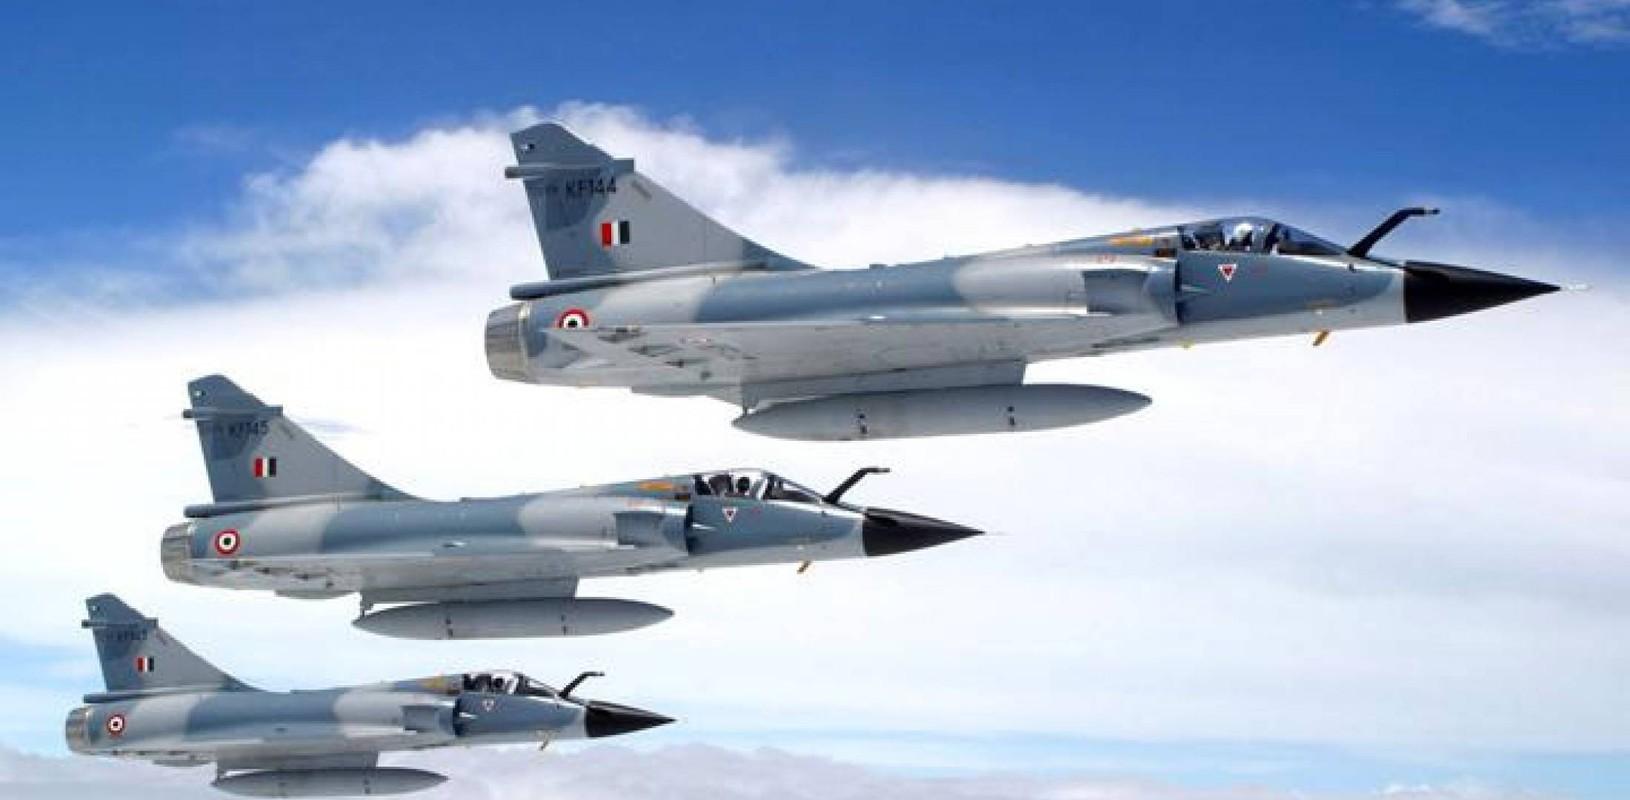 Vi sao chien dau co F-16 van dat hang, con Mirage 2000 thi khong?-Hinh-7